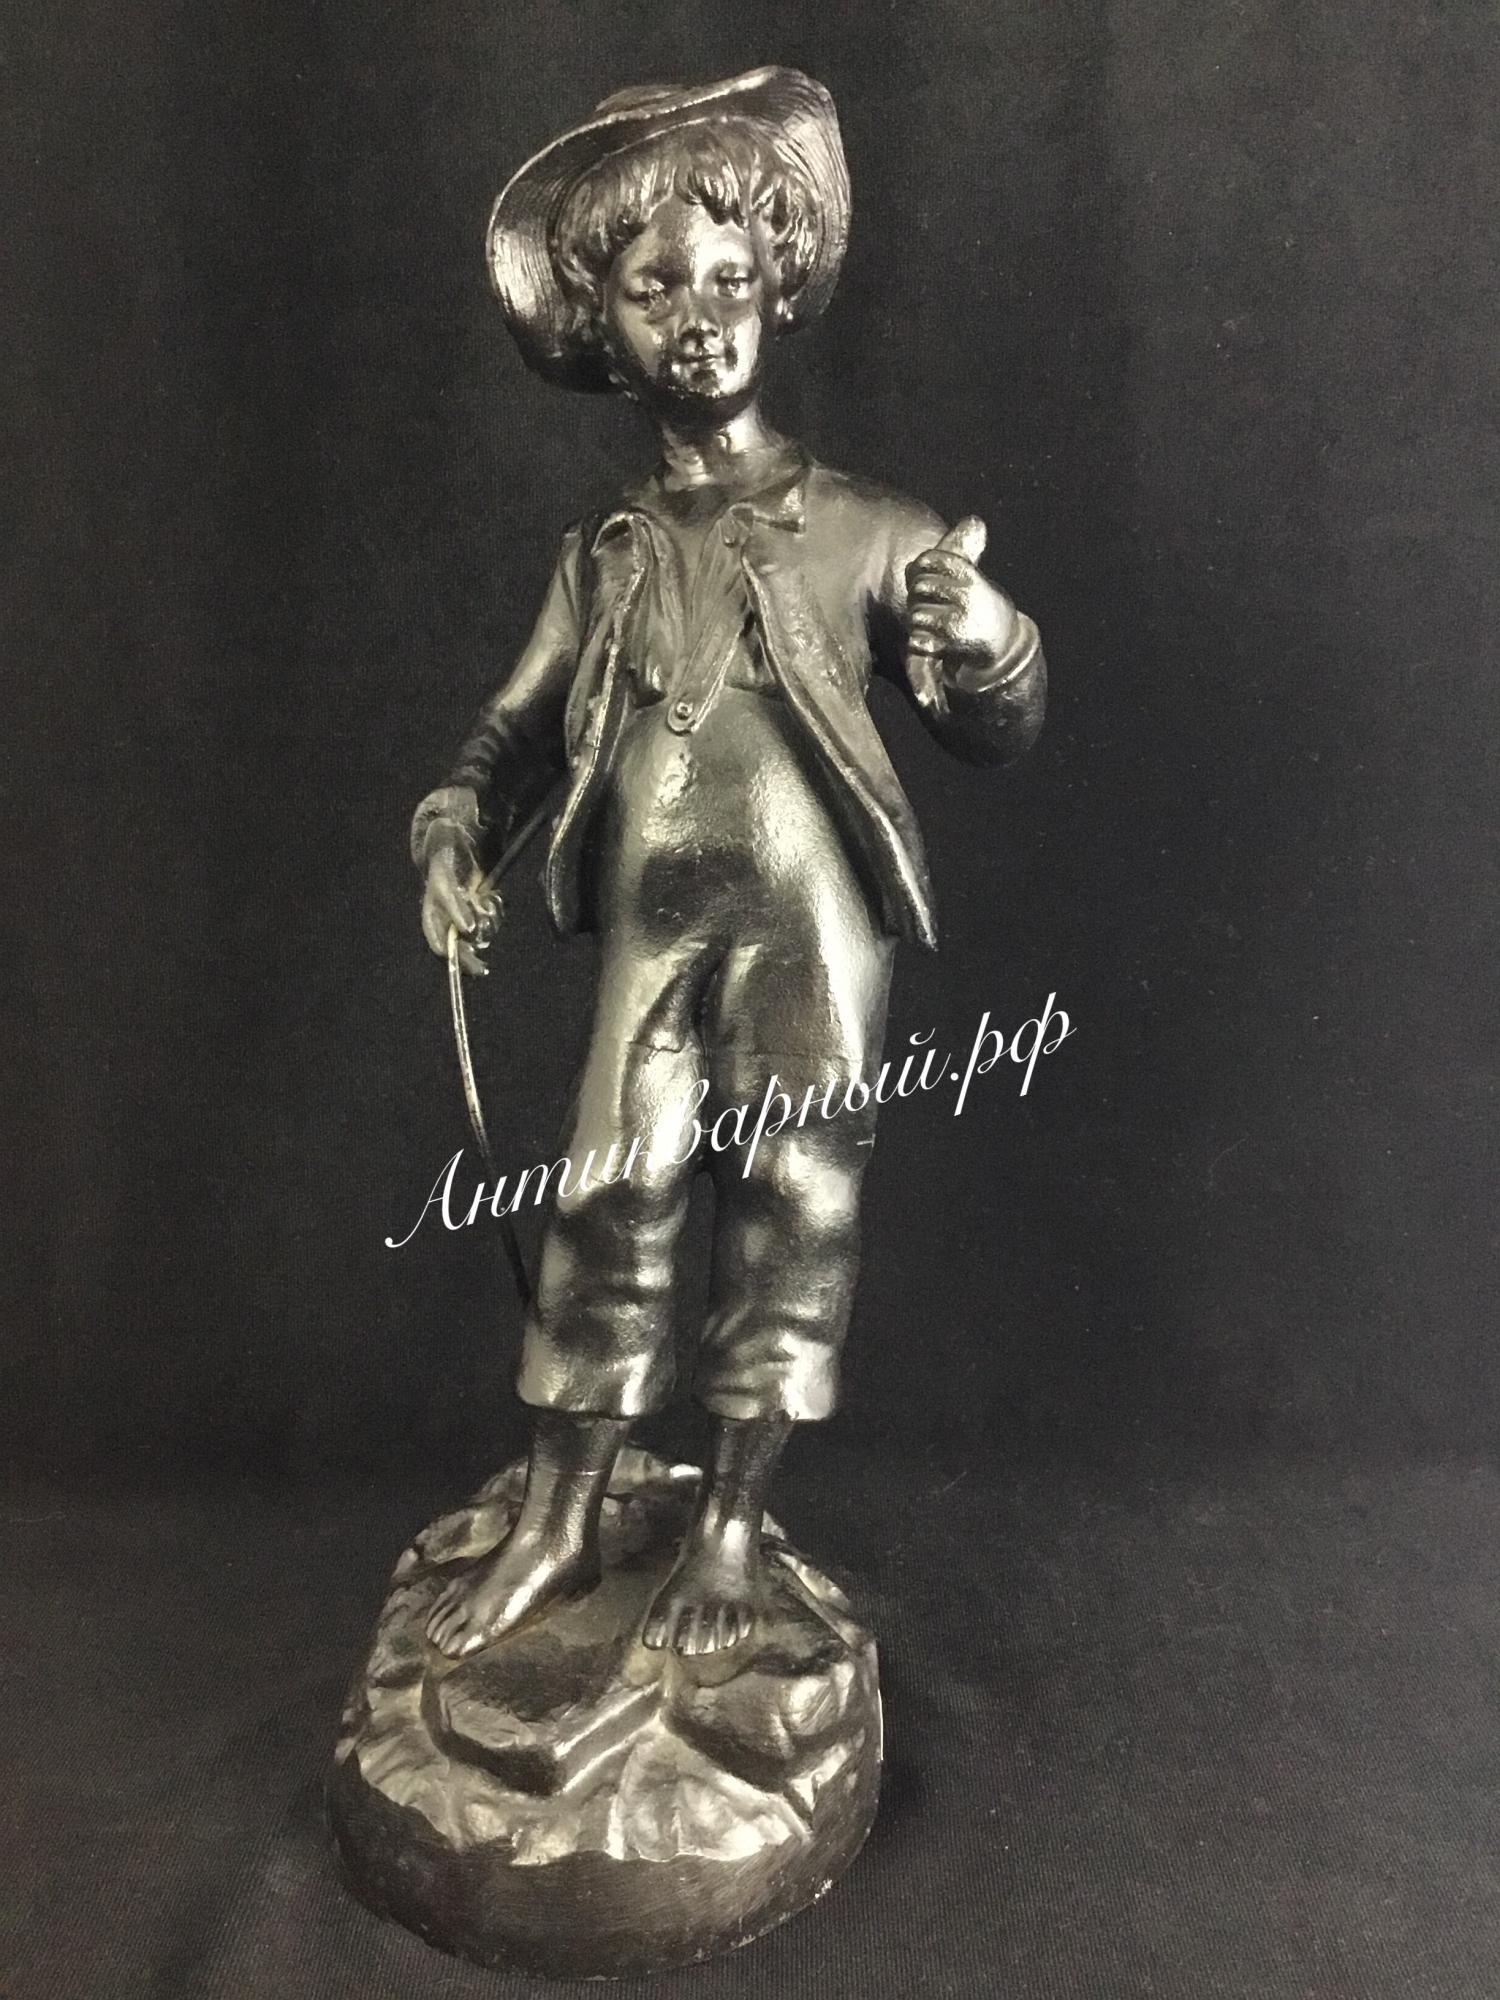 Скульптура из чугуна Мальчик рыбак. Куса 1982 год